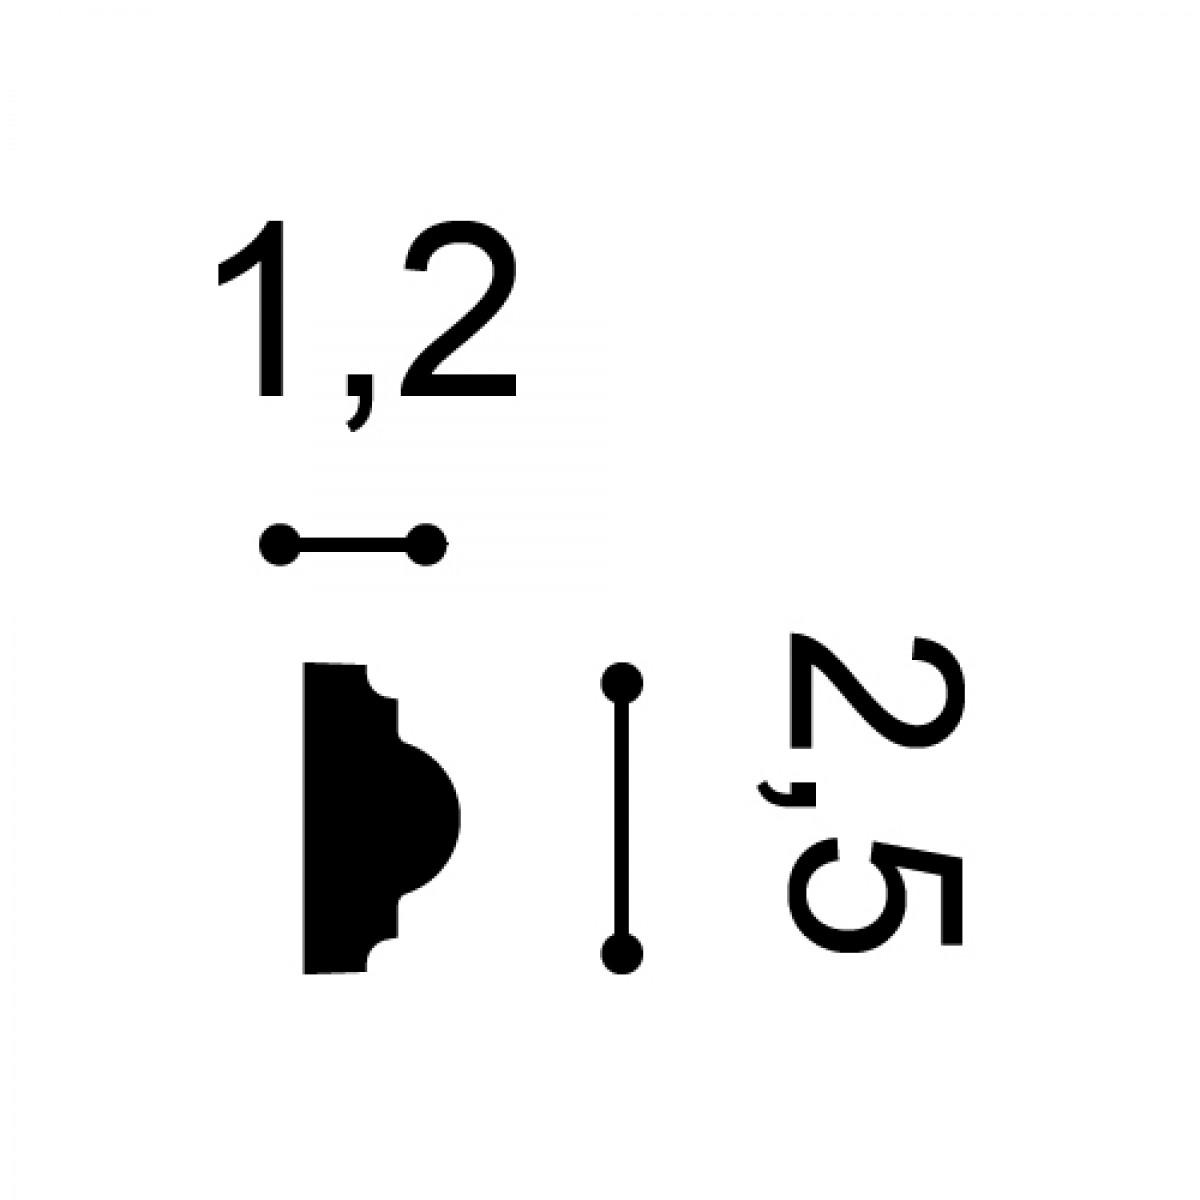 Brau Axxent PX103, Dimensiuni: 200 X 2.5 X 1.2 cm, Orac Decor